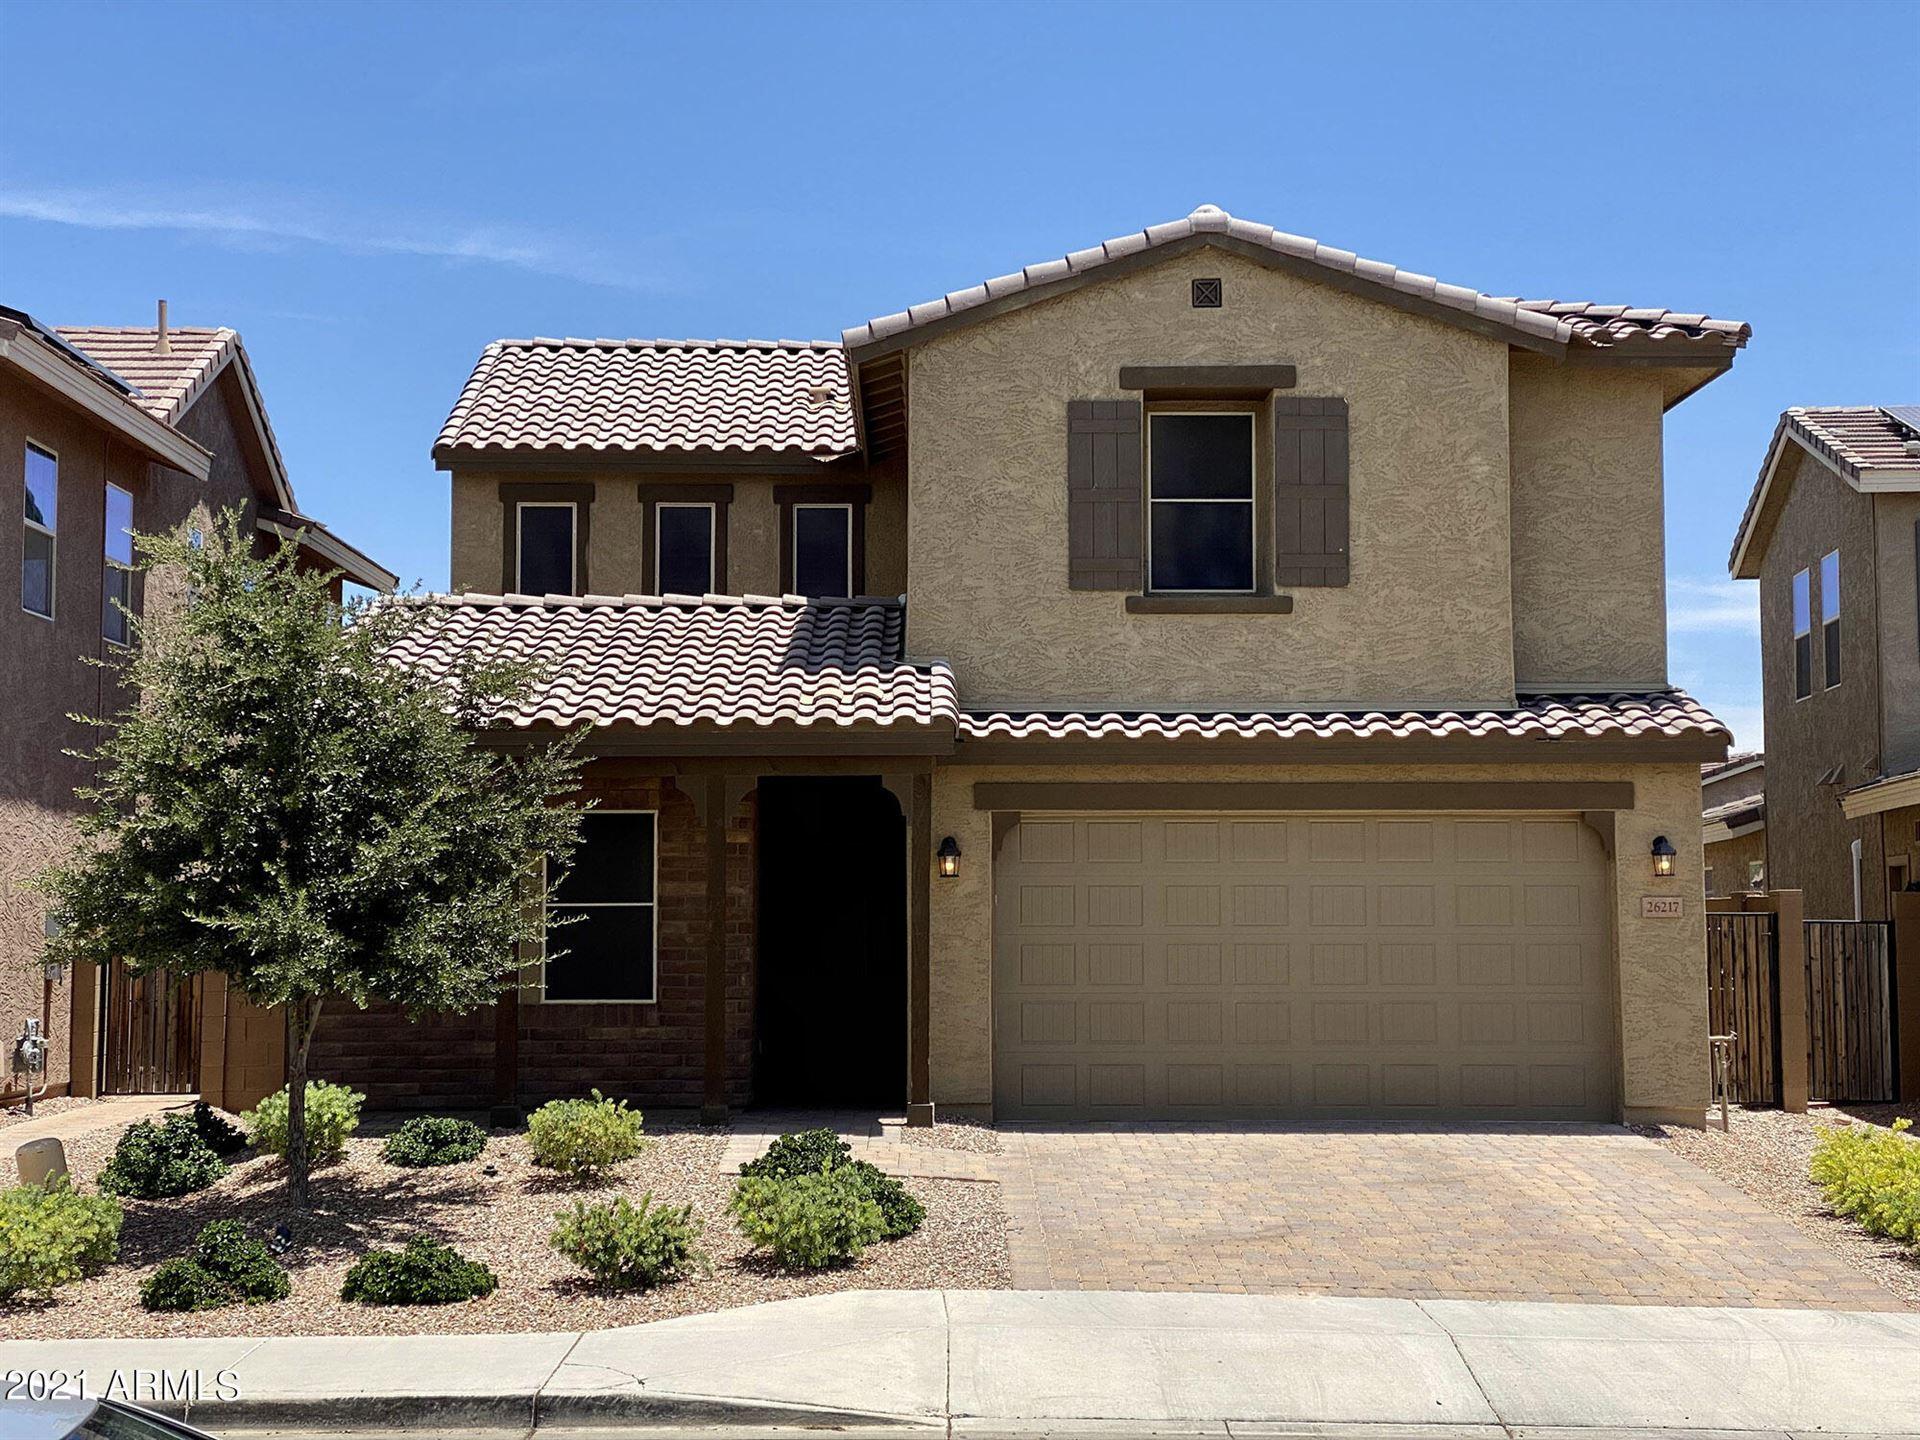 Photo of 26217 N 121ST Lane, Peoria, AZ 85383 (MLS # 6249464)